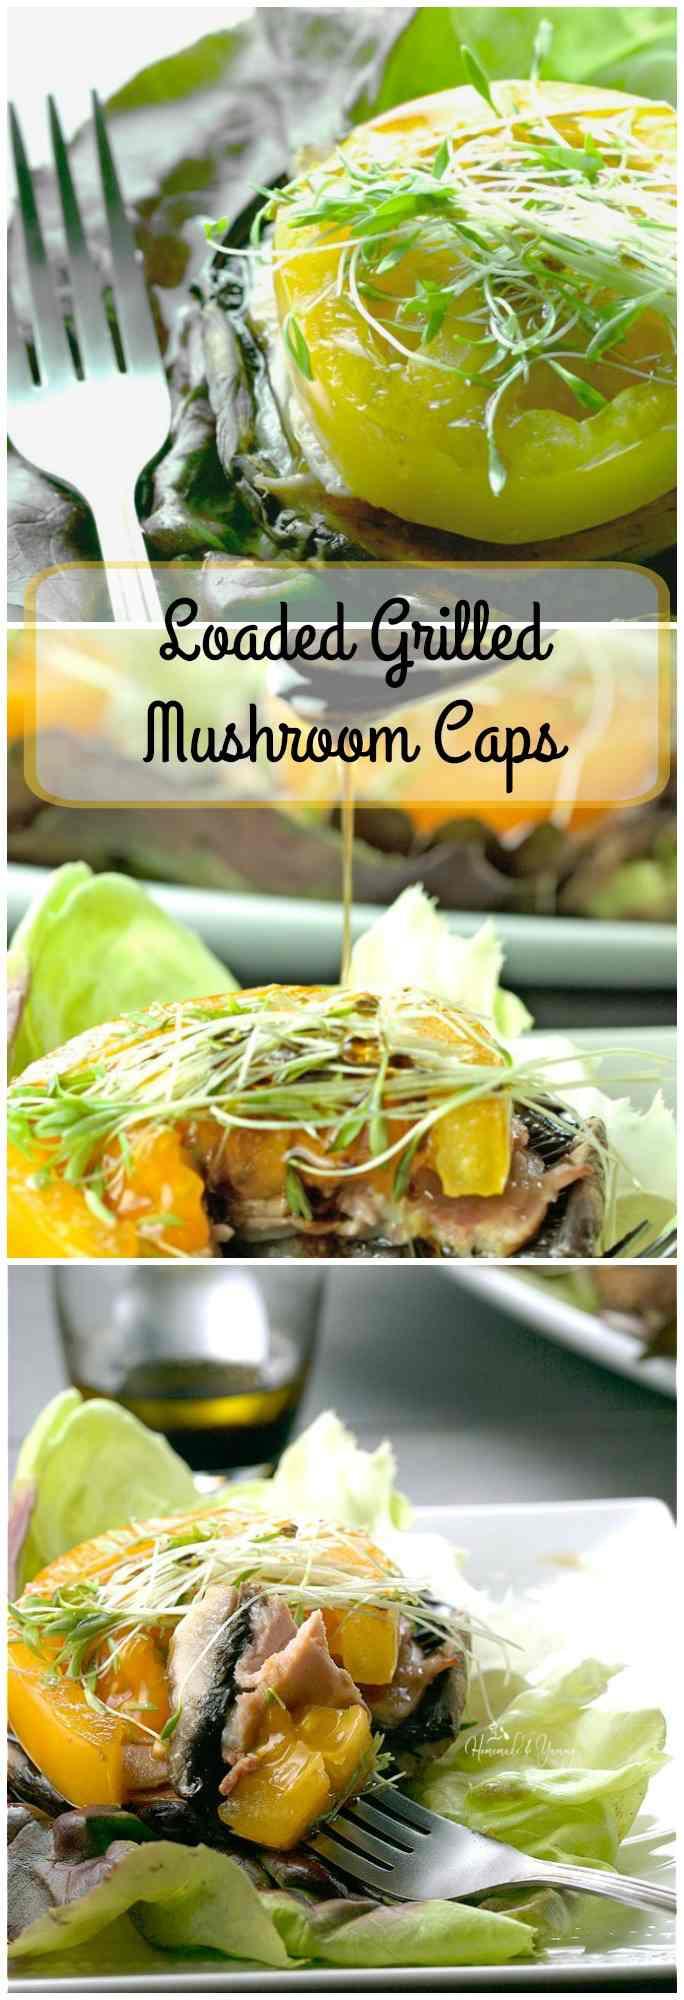 Loaded Grilled Mushroom Caps long pin image.